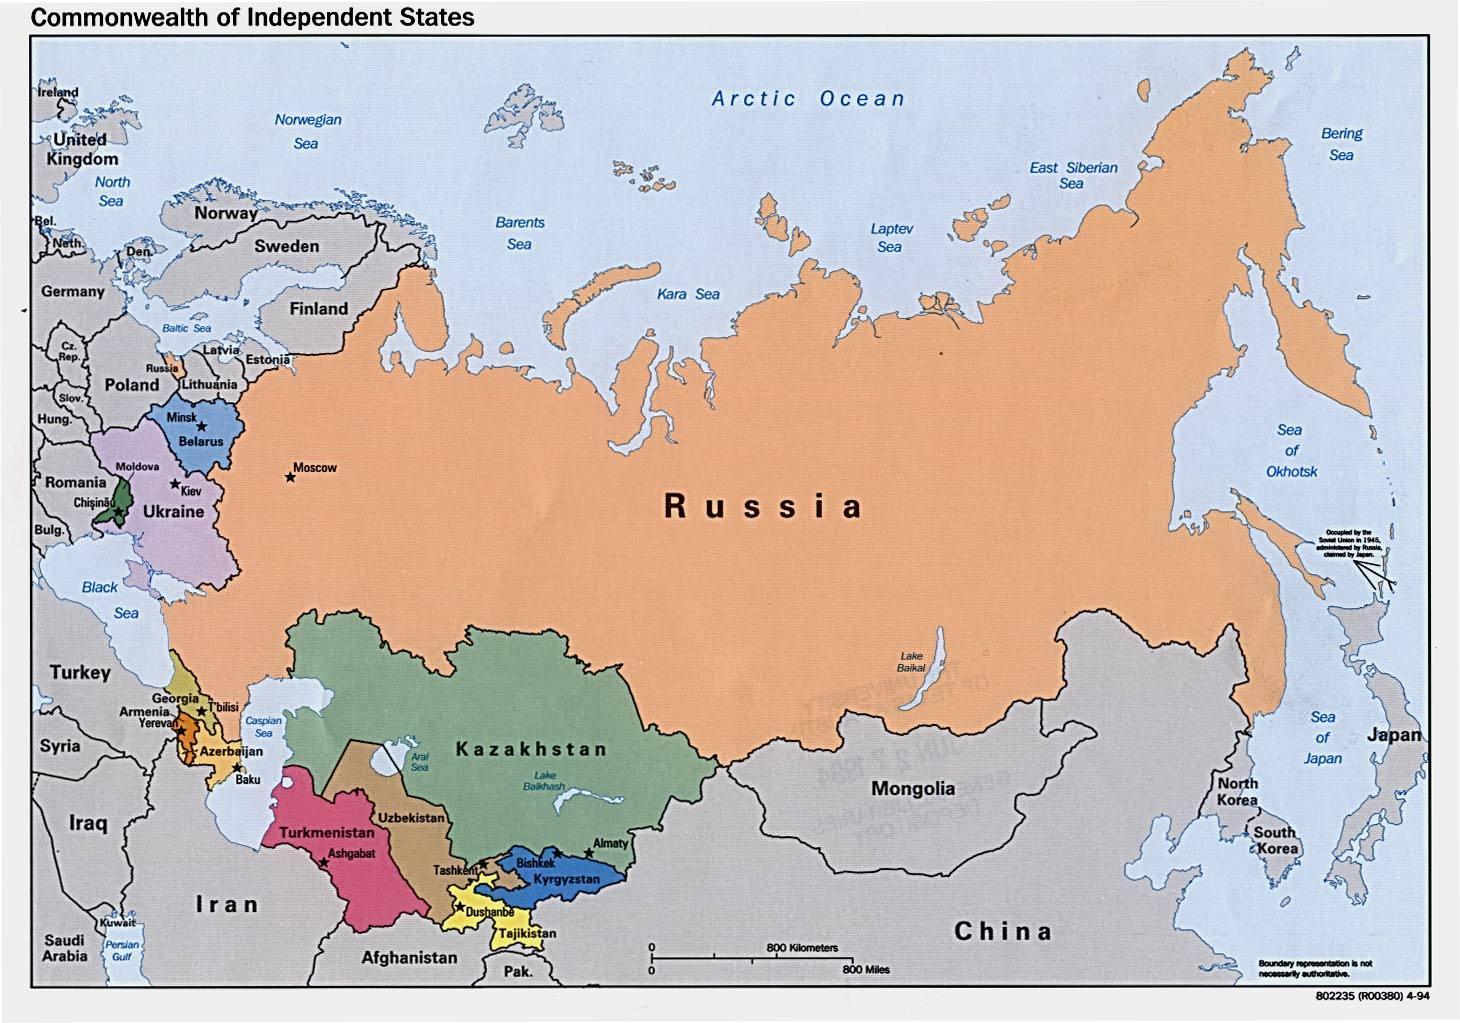 karta europa azerbaijan Karta över Ryssland   Karta över Ryssland skriv (Östra Europa  karta europa azerbaijan